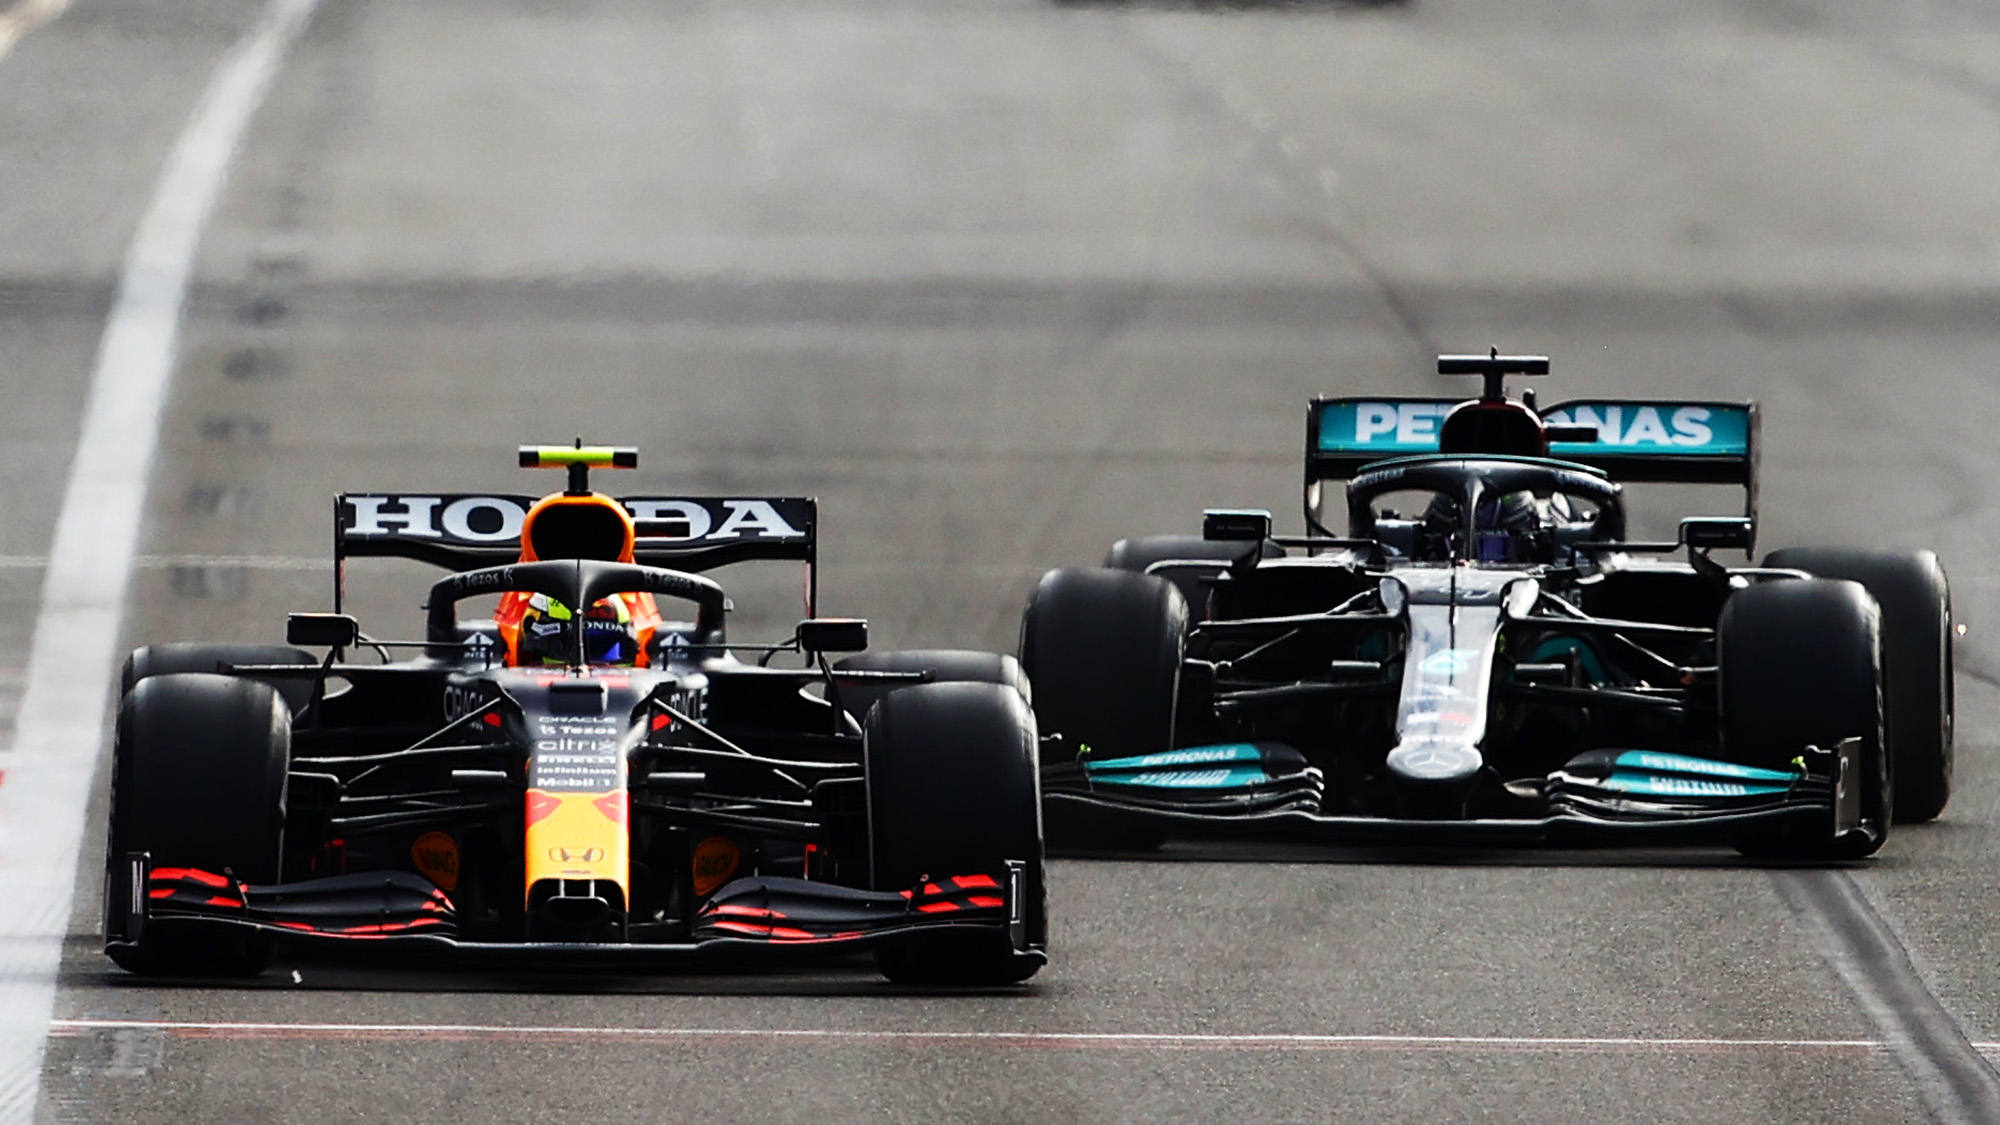 Sergio Perez and Lewis Hamilton battle at the 2021 Azerbaijan Grand Prix